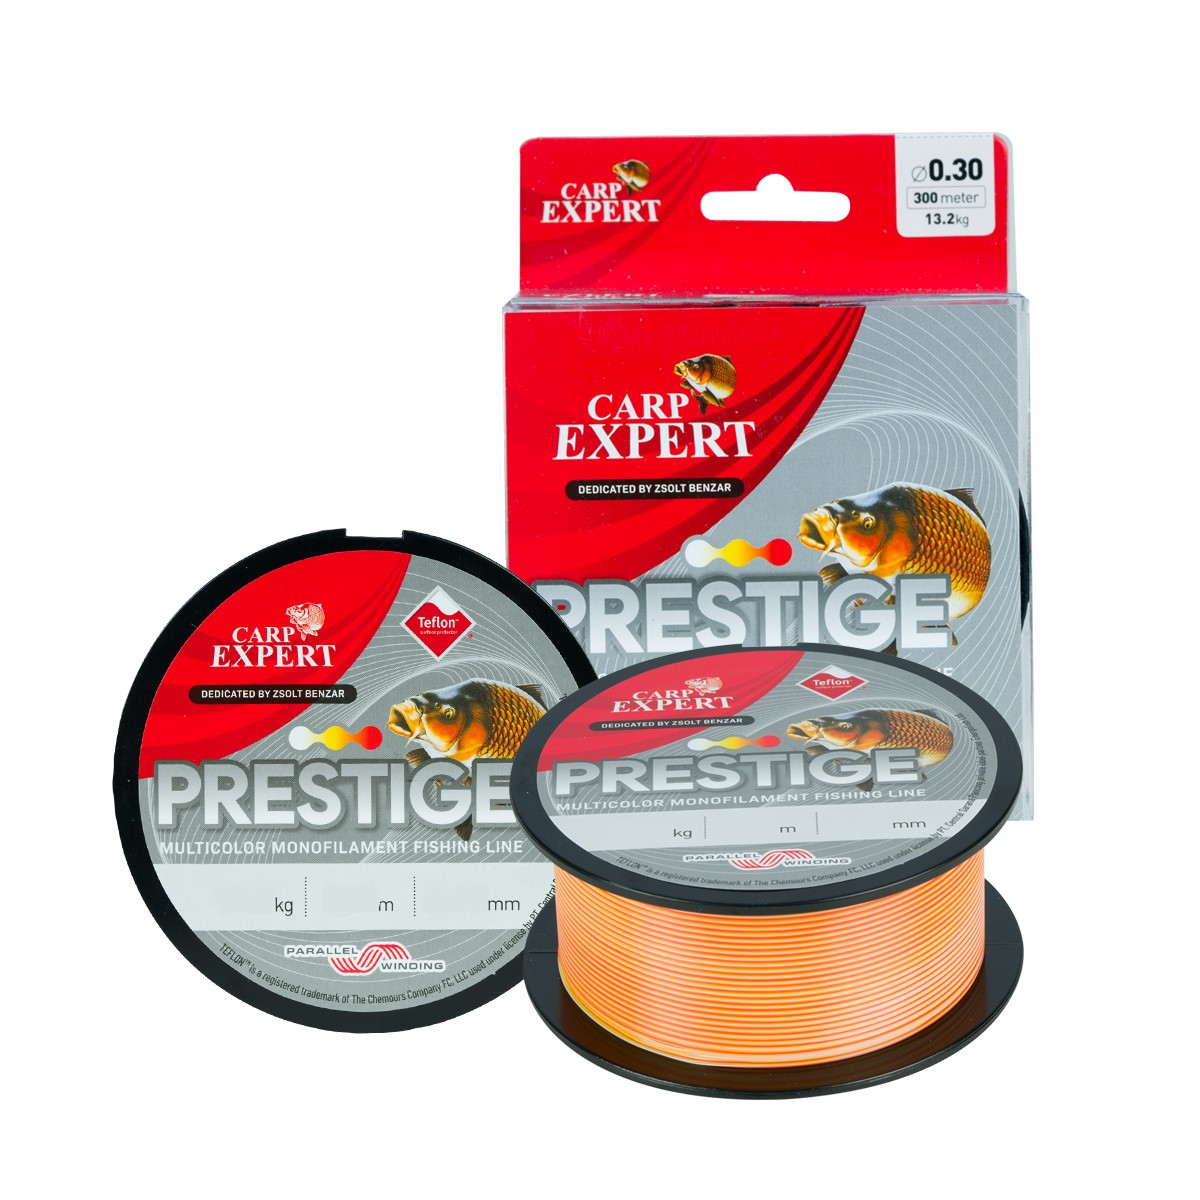 Fir Monofilament Carp Expert Prestige Multicolor 0,30mm / 300m / 13,2 kg - 30126030